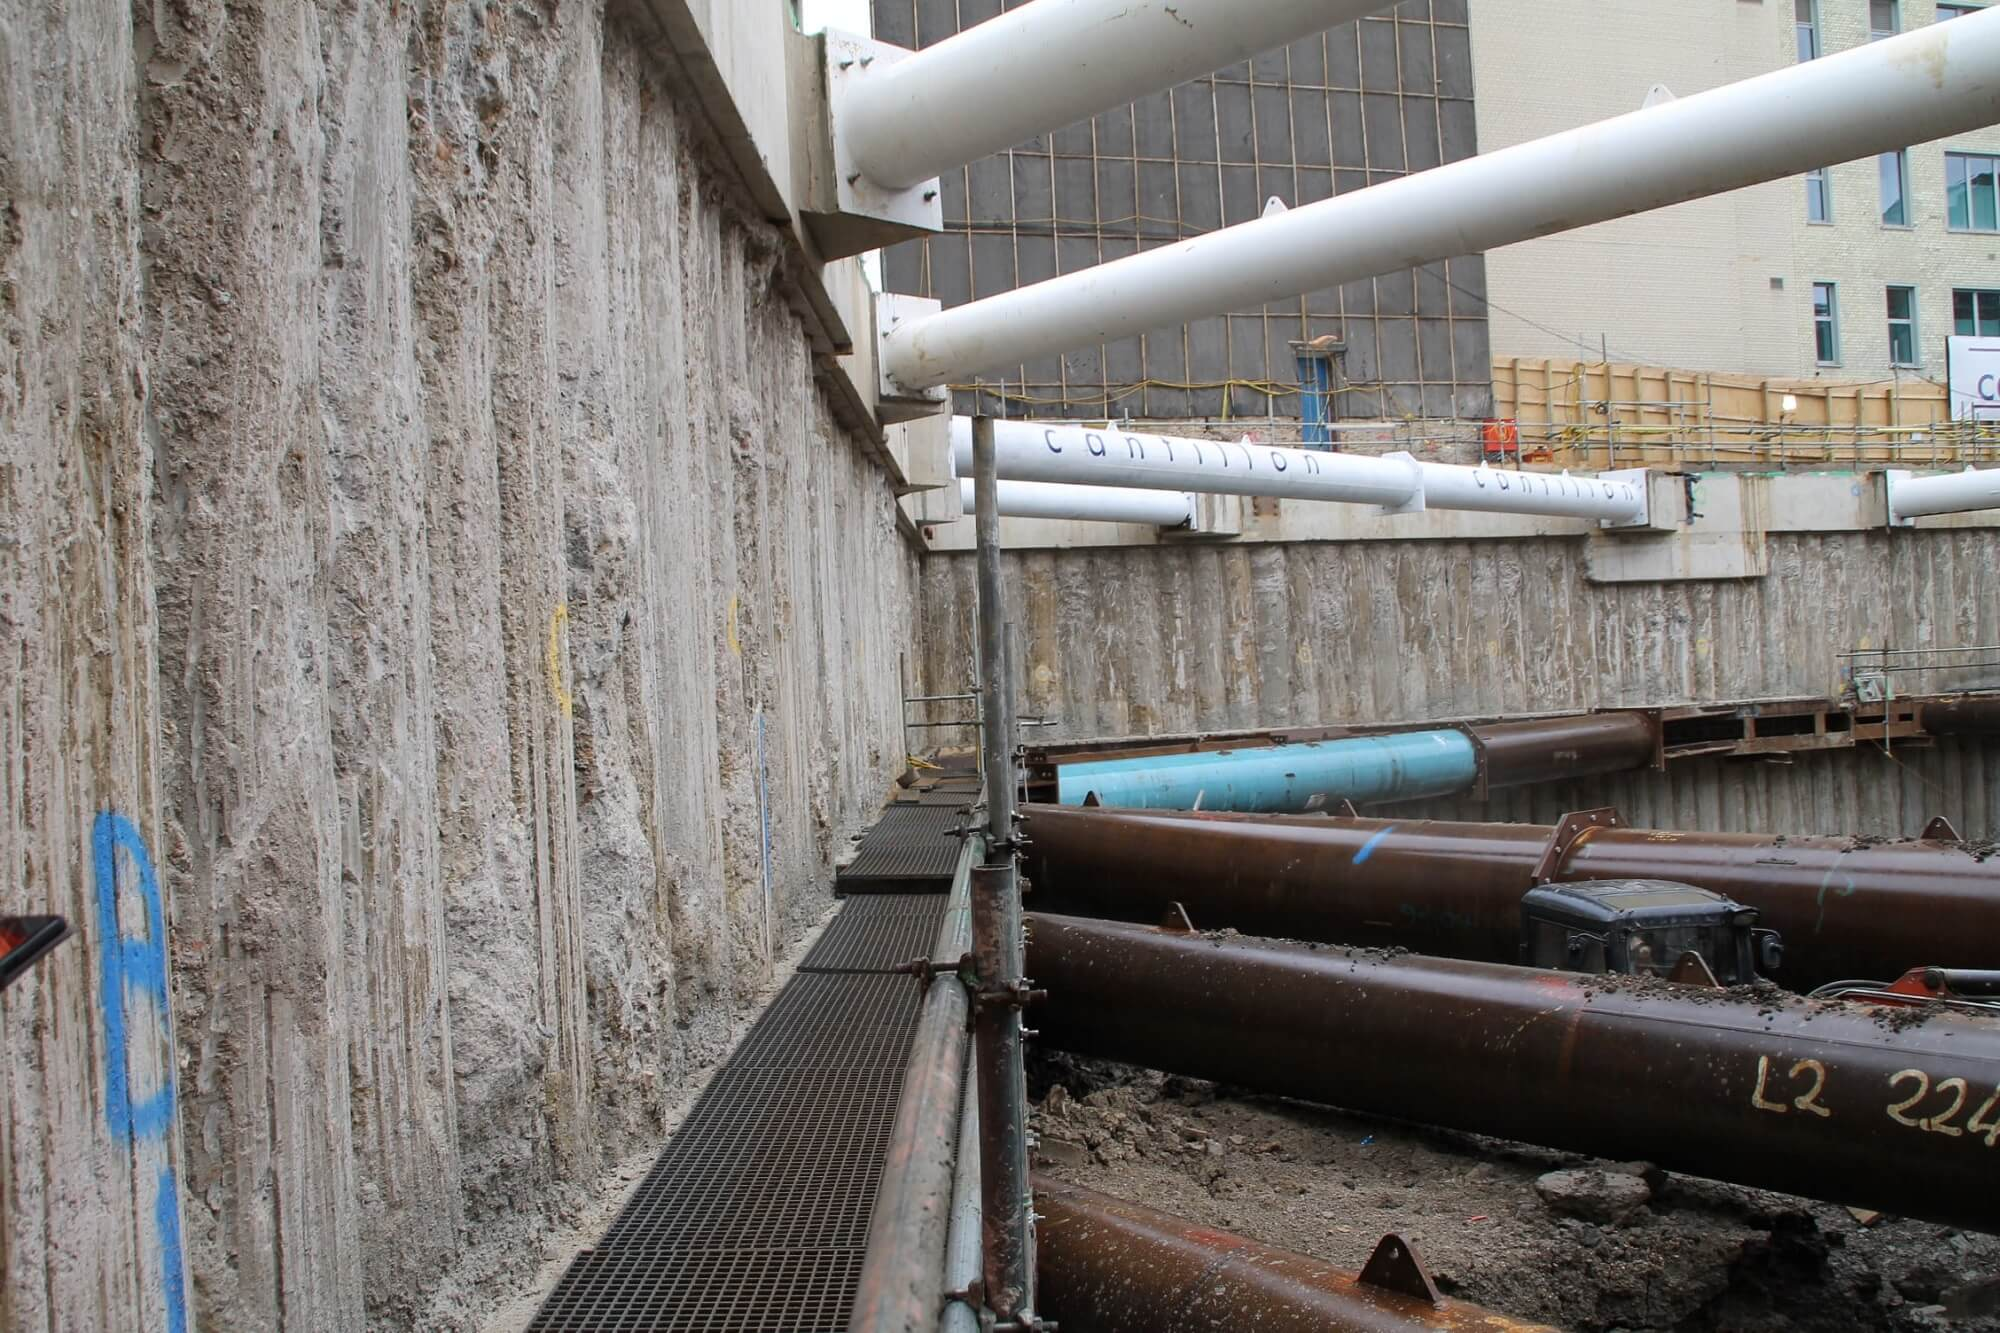 Retaining Wall Solution - Ilona Rose House, Tottenham Court Road - LDA piling Secant Wall Basement (1)